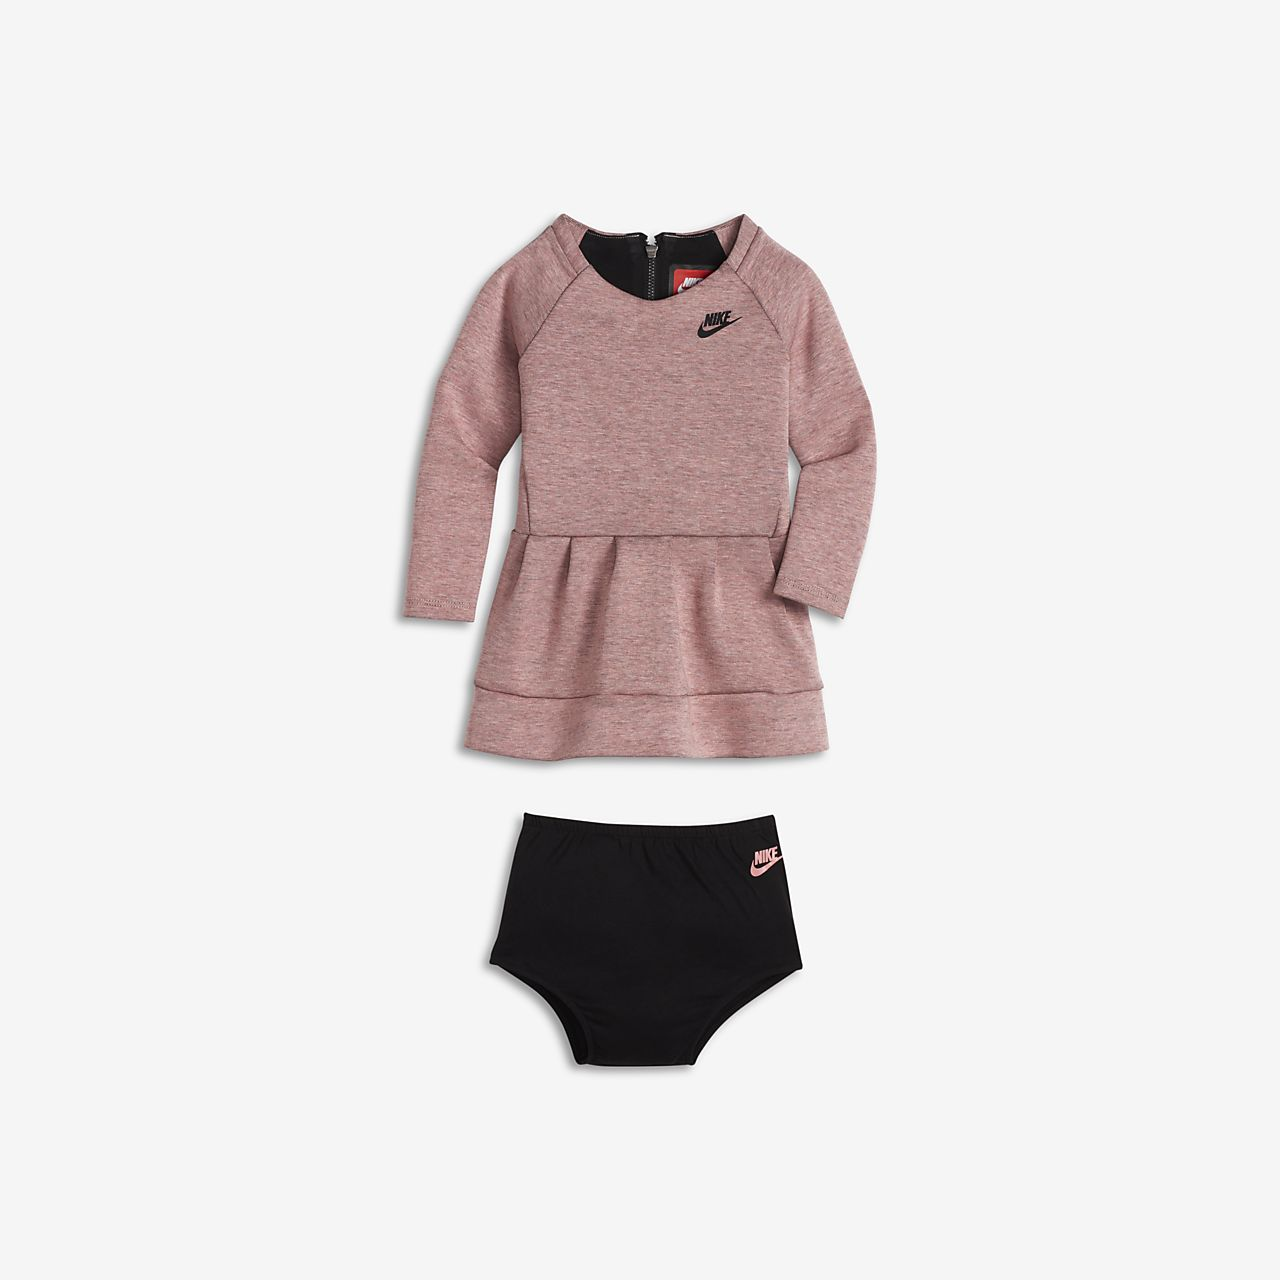 2a12a7d8d5d7 Nike Tech Fleece Vestit - Nadó i infant (nena). Nike.com ES